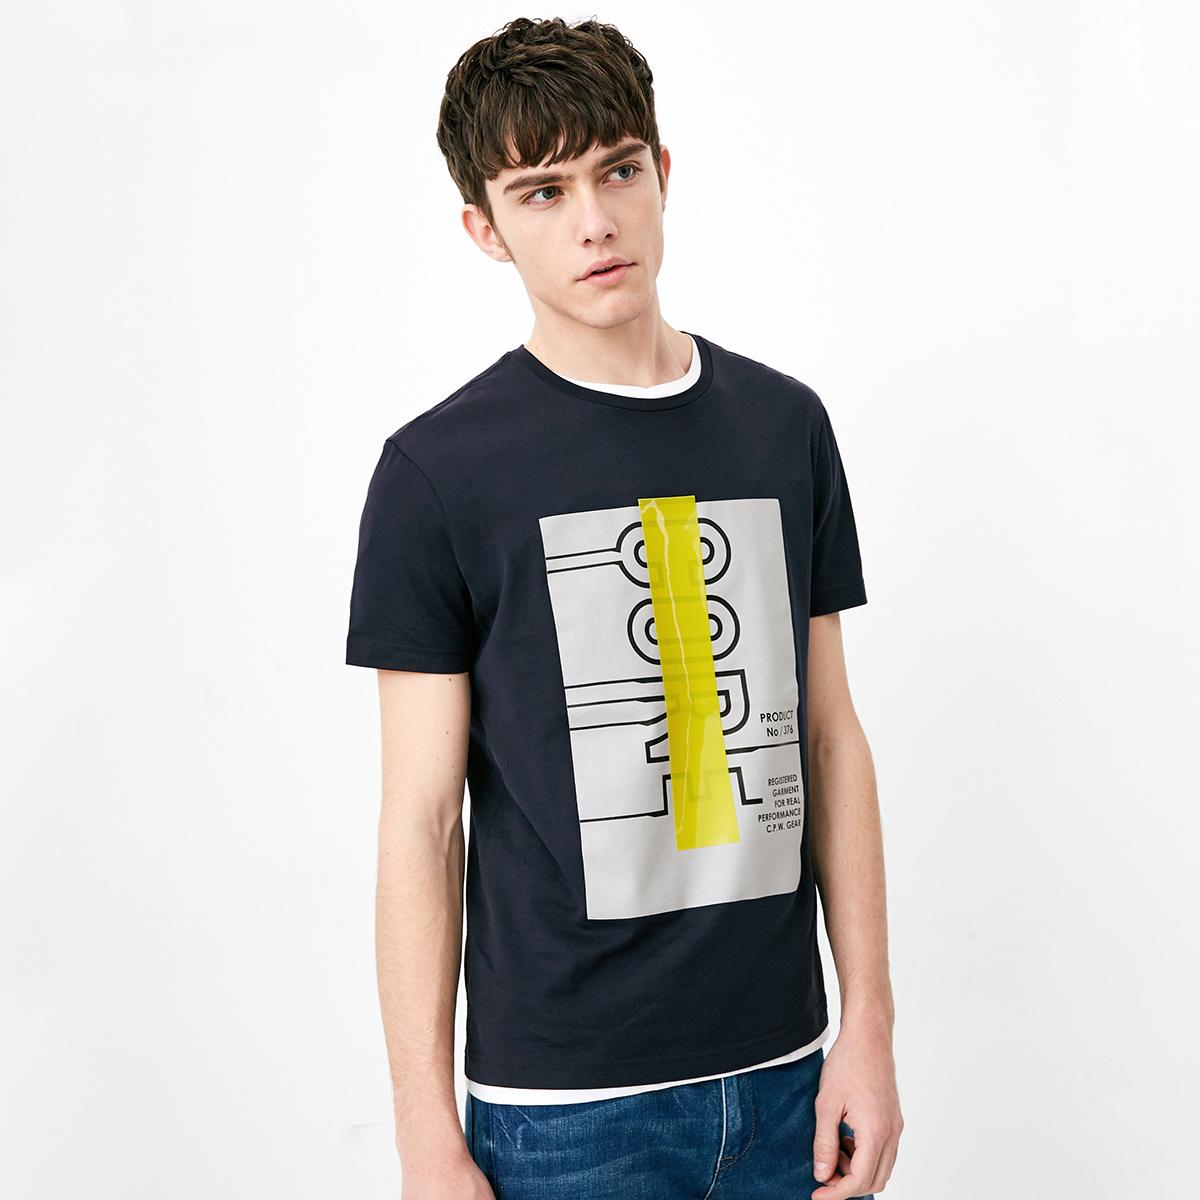 JackJones杰克琼斯男装纯棉字母胶印短袖T恤S 217101568